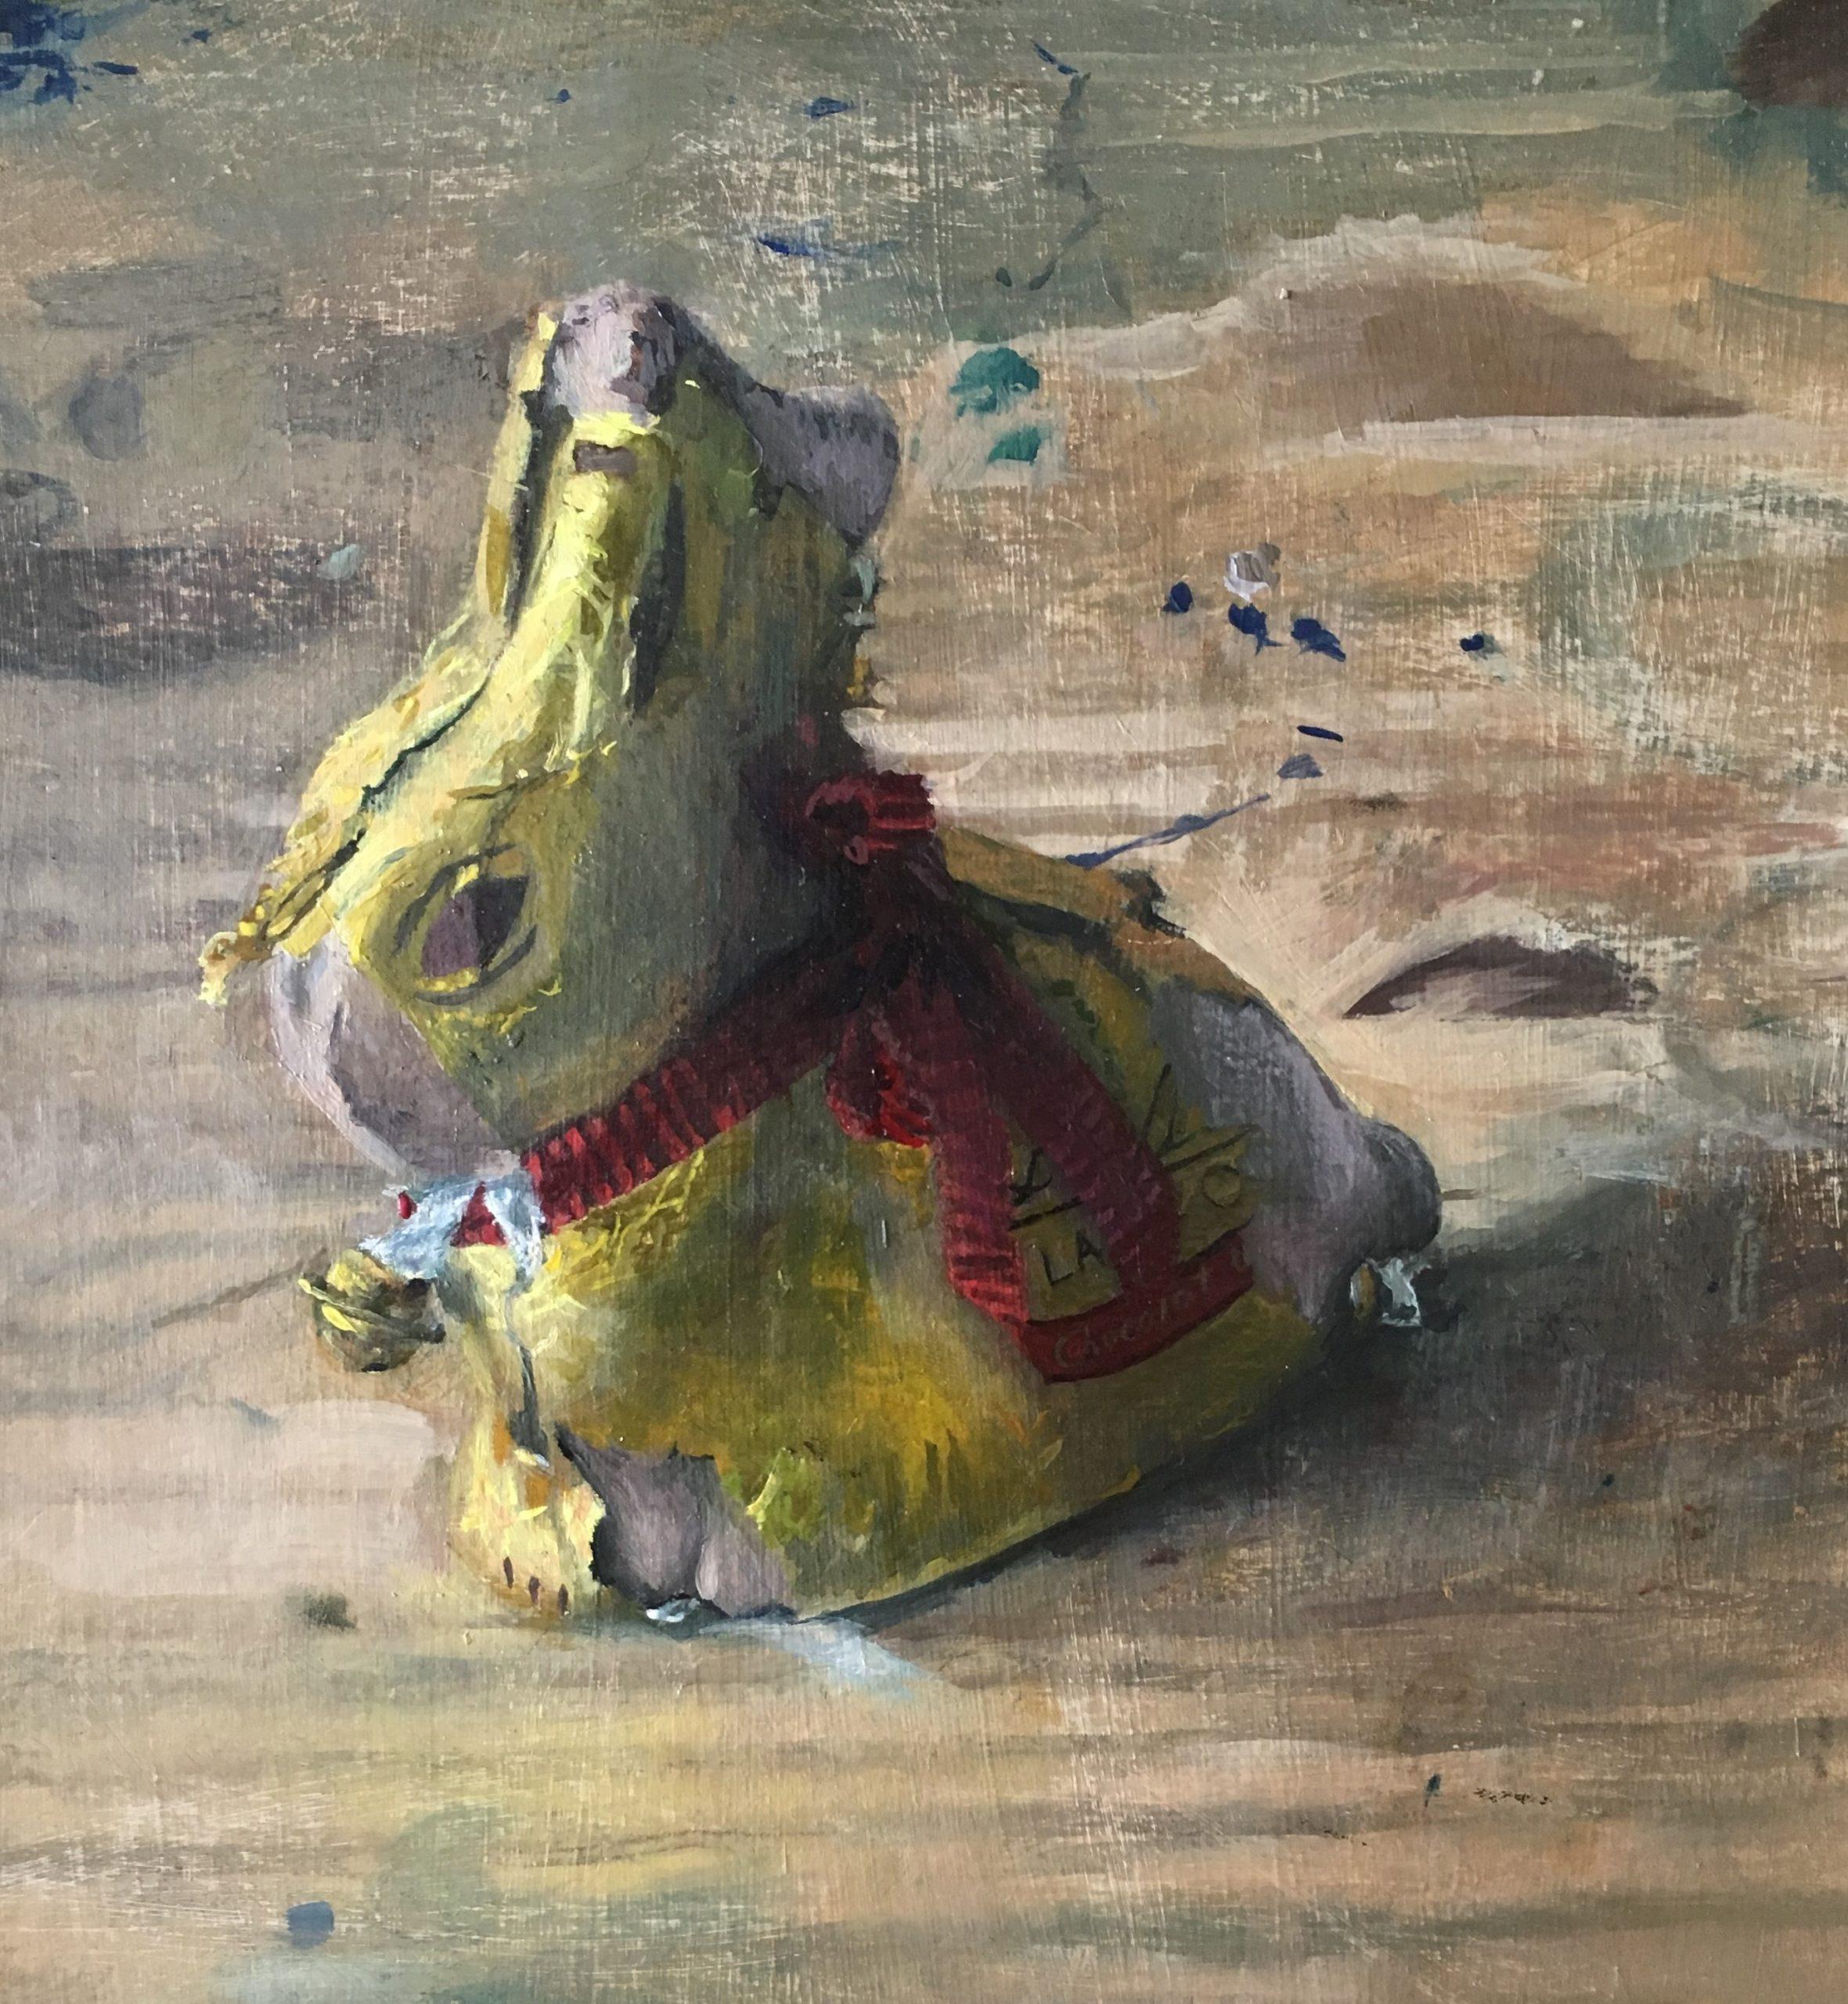 Last Year's Easter Bunny Sam Rachamin Oil on paper 20 x 24 cm